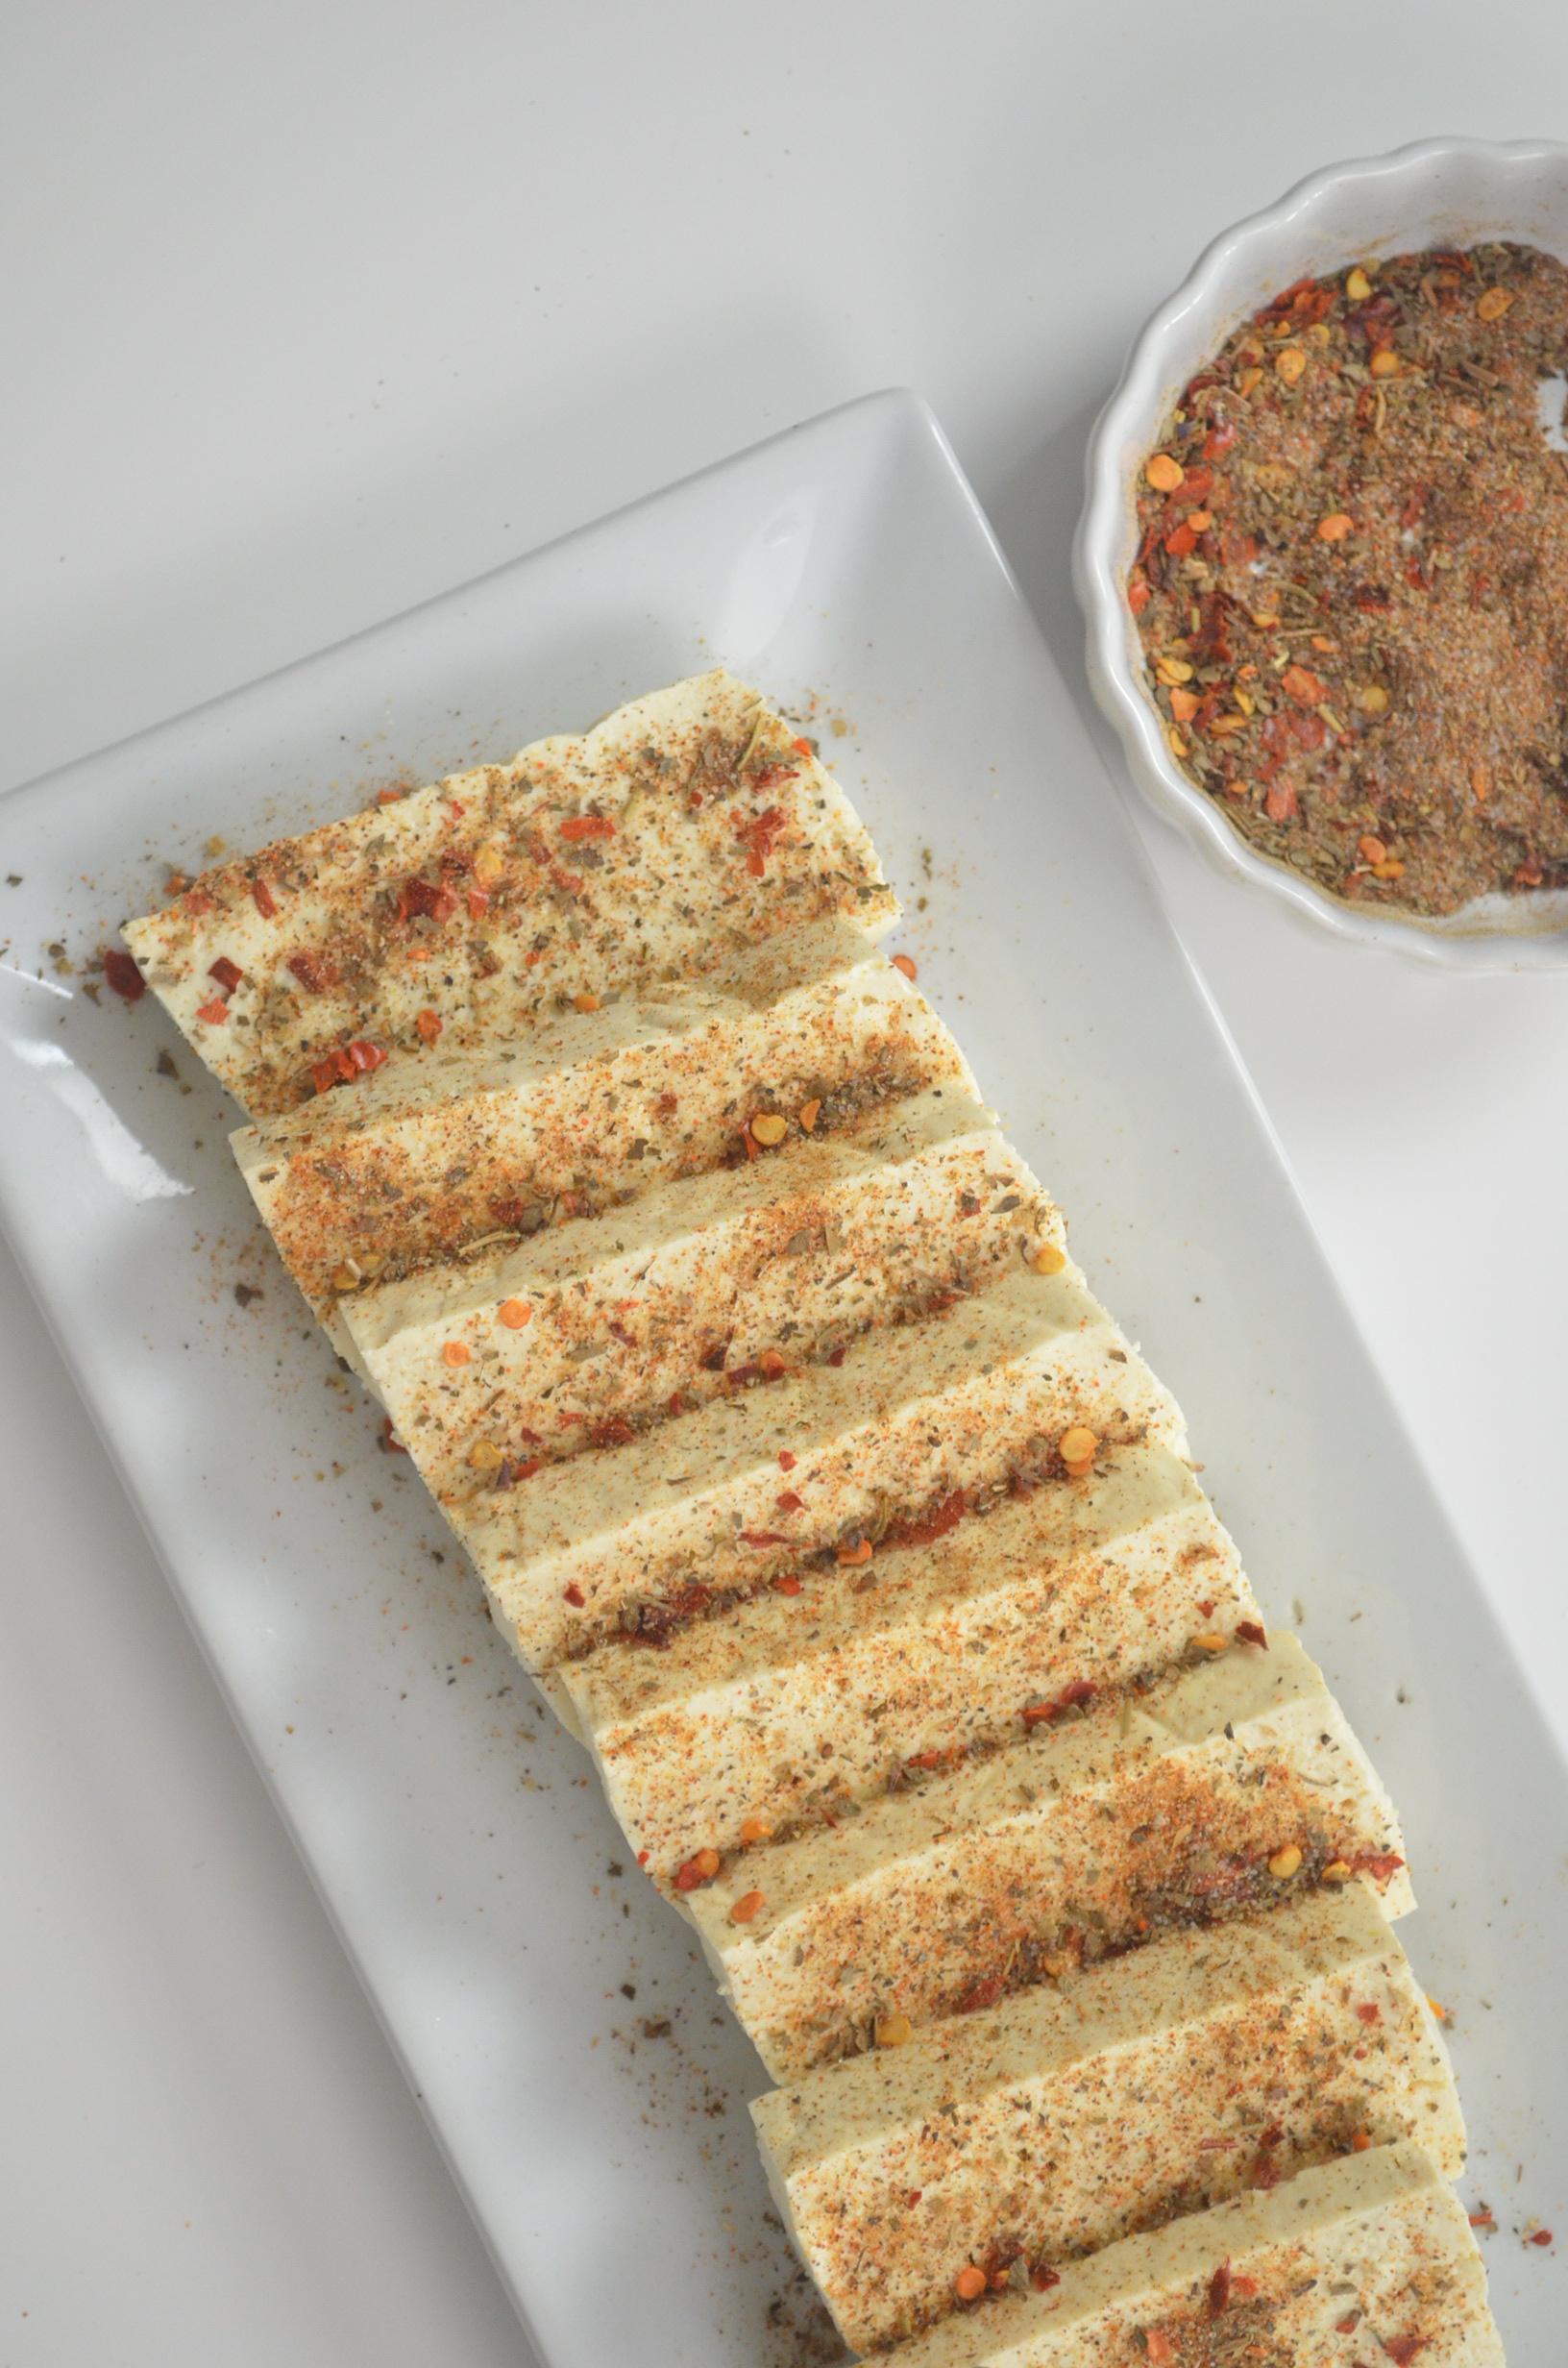 Baked Spiced Tofu